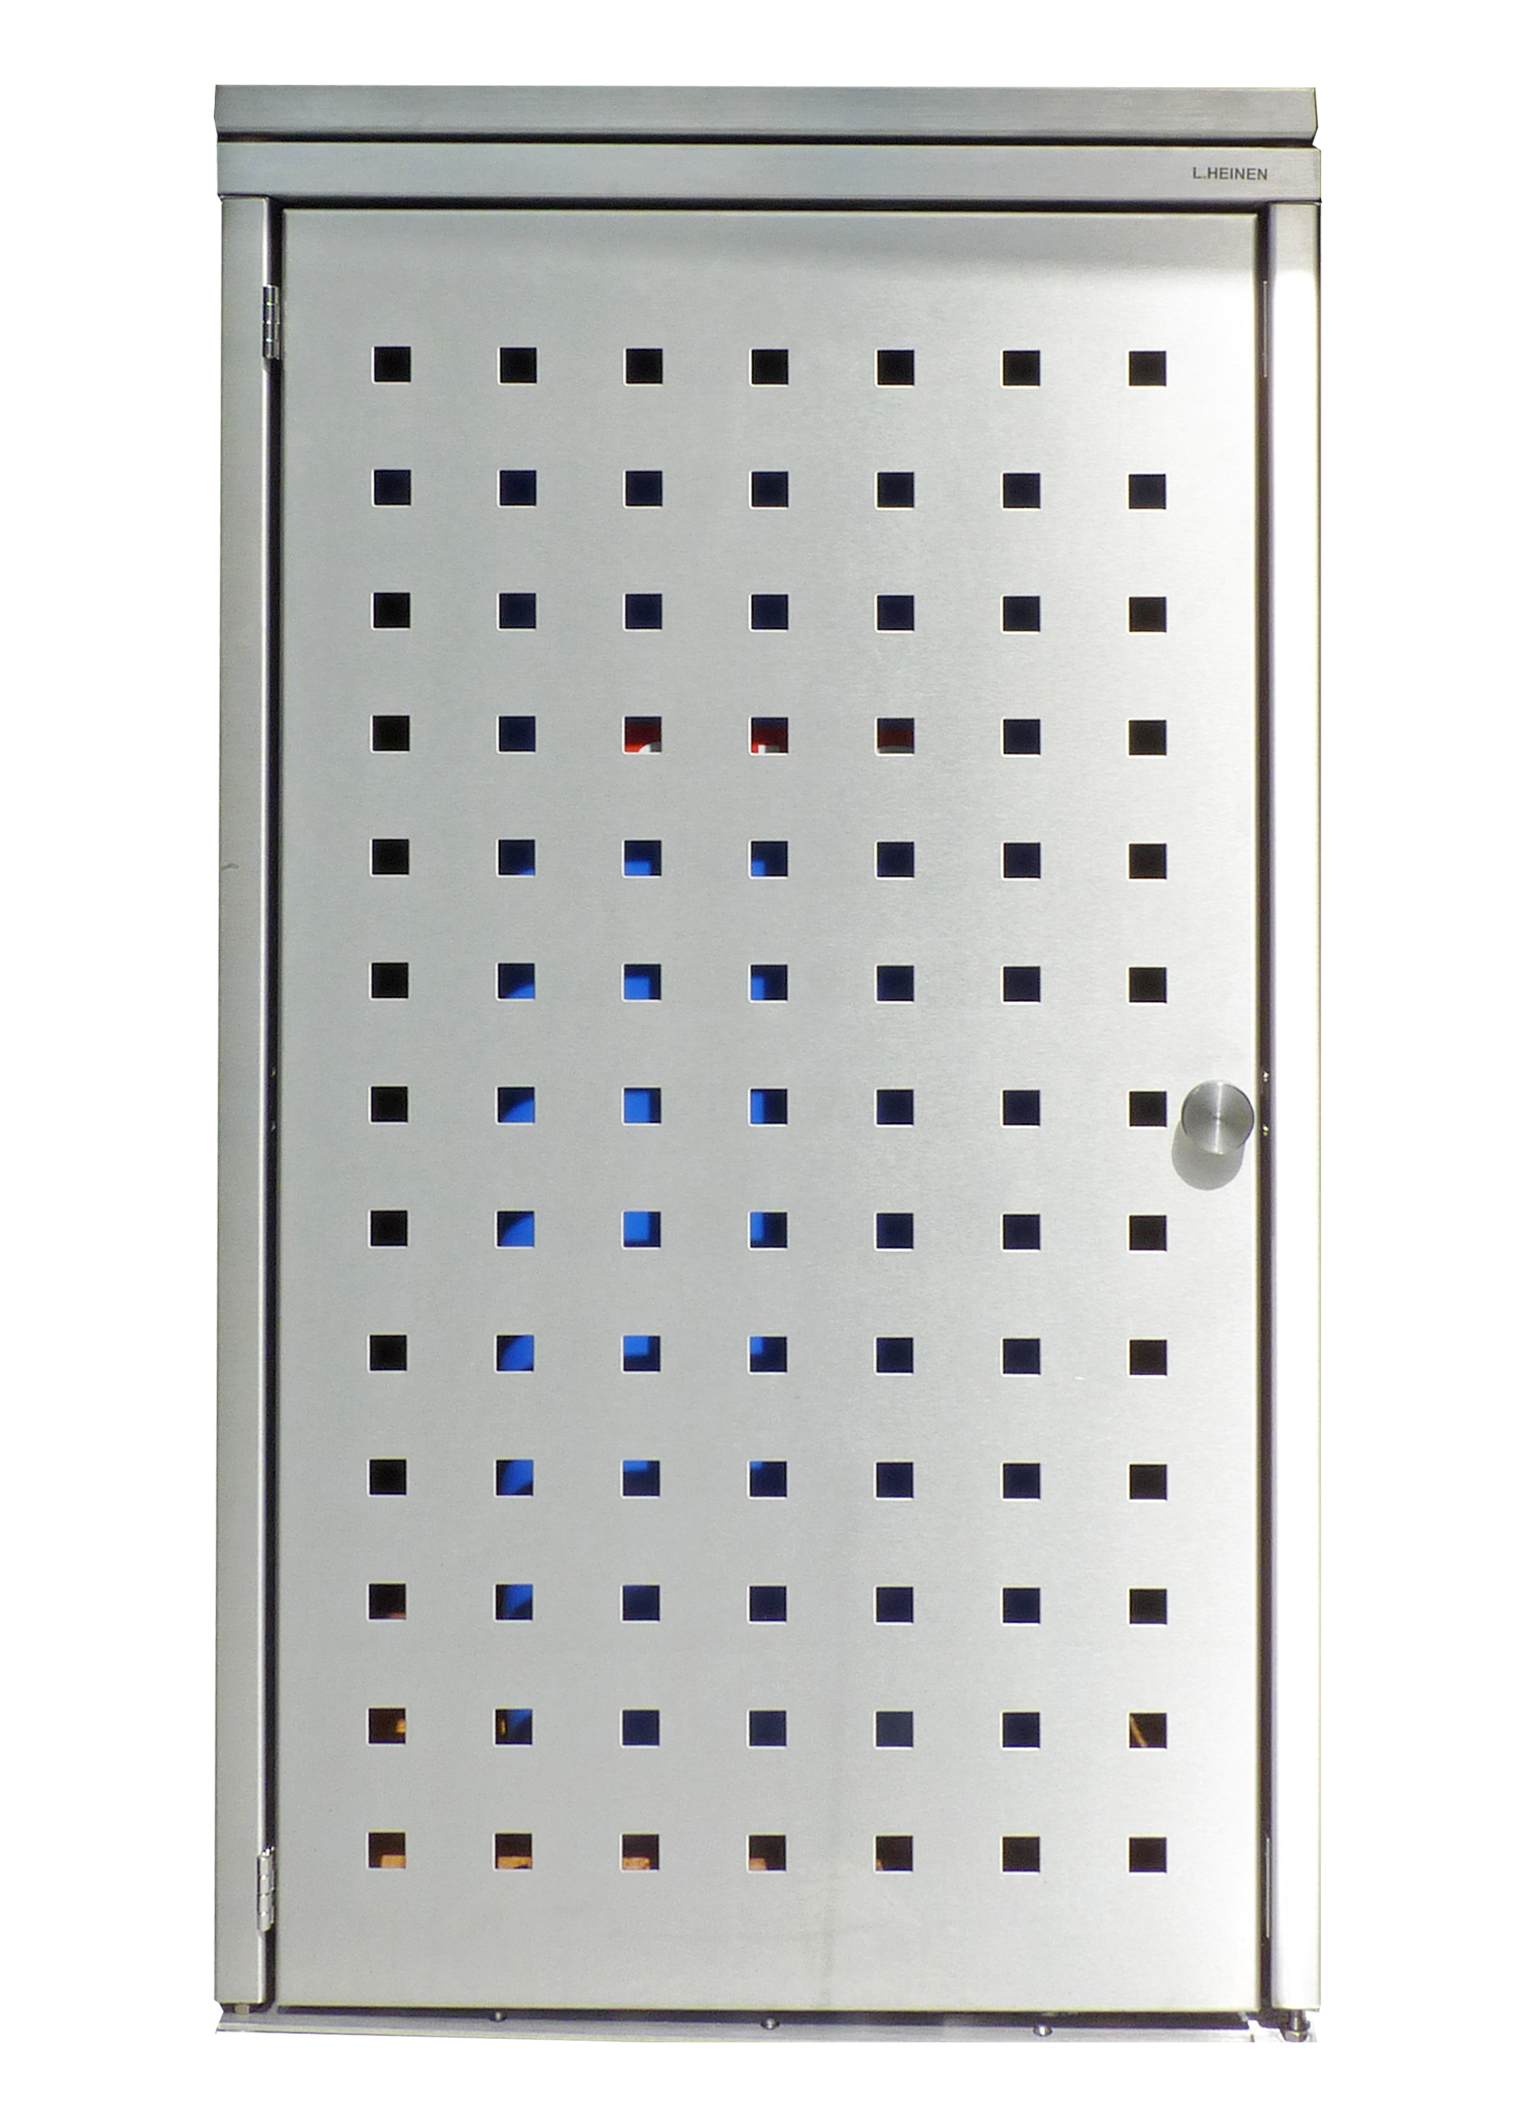 MÜLLTONNEN-BOX 120 LITER LINKS